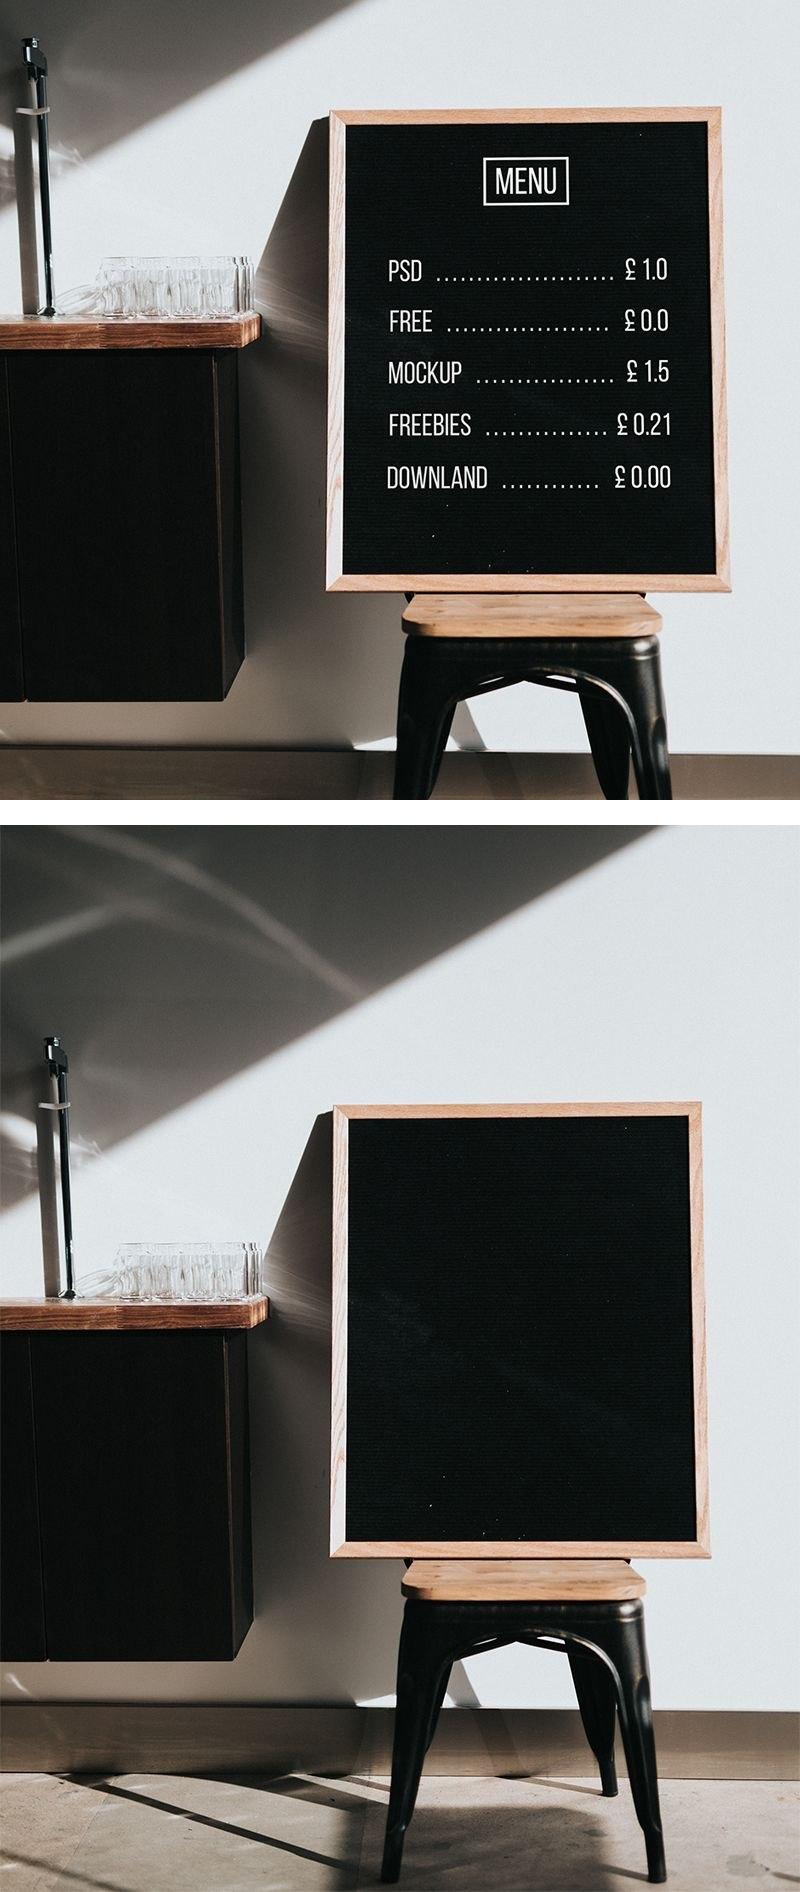 Free Menu Board Mockup Psd Template  Design Inspiration  Menu Intended For Menu Board Design Templates Free